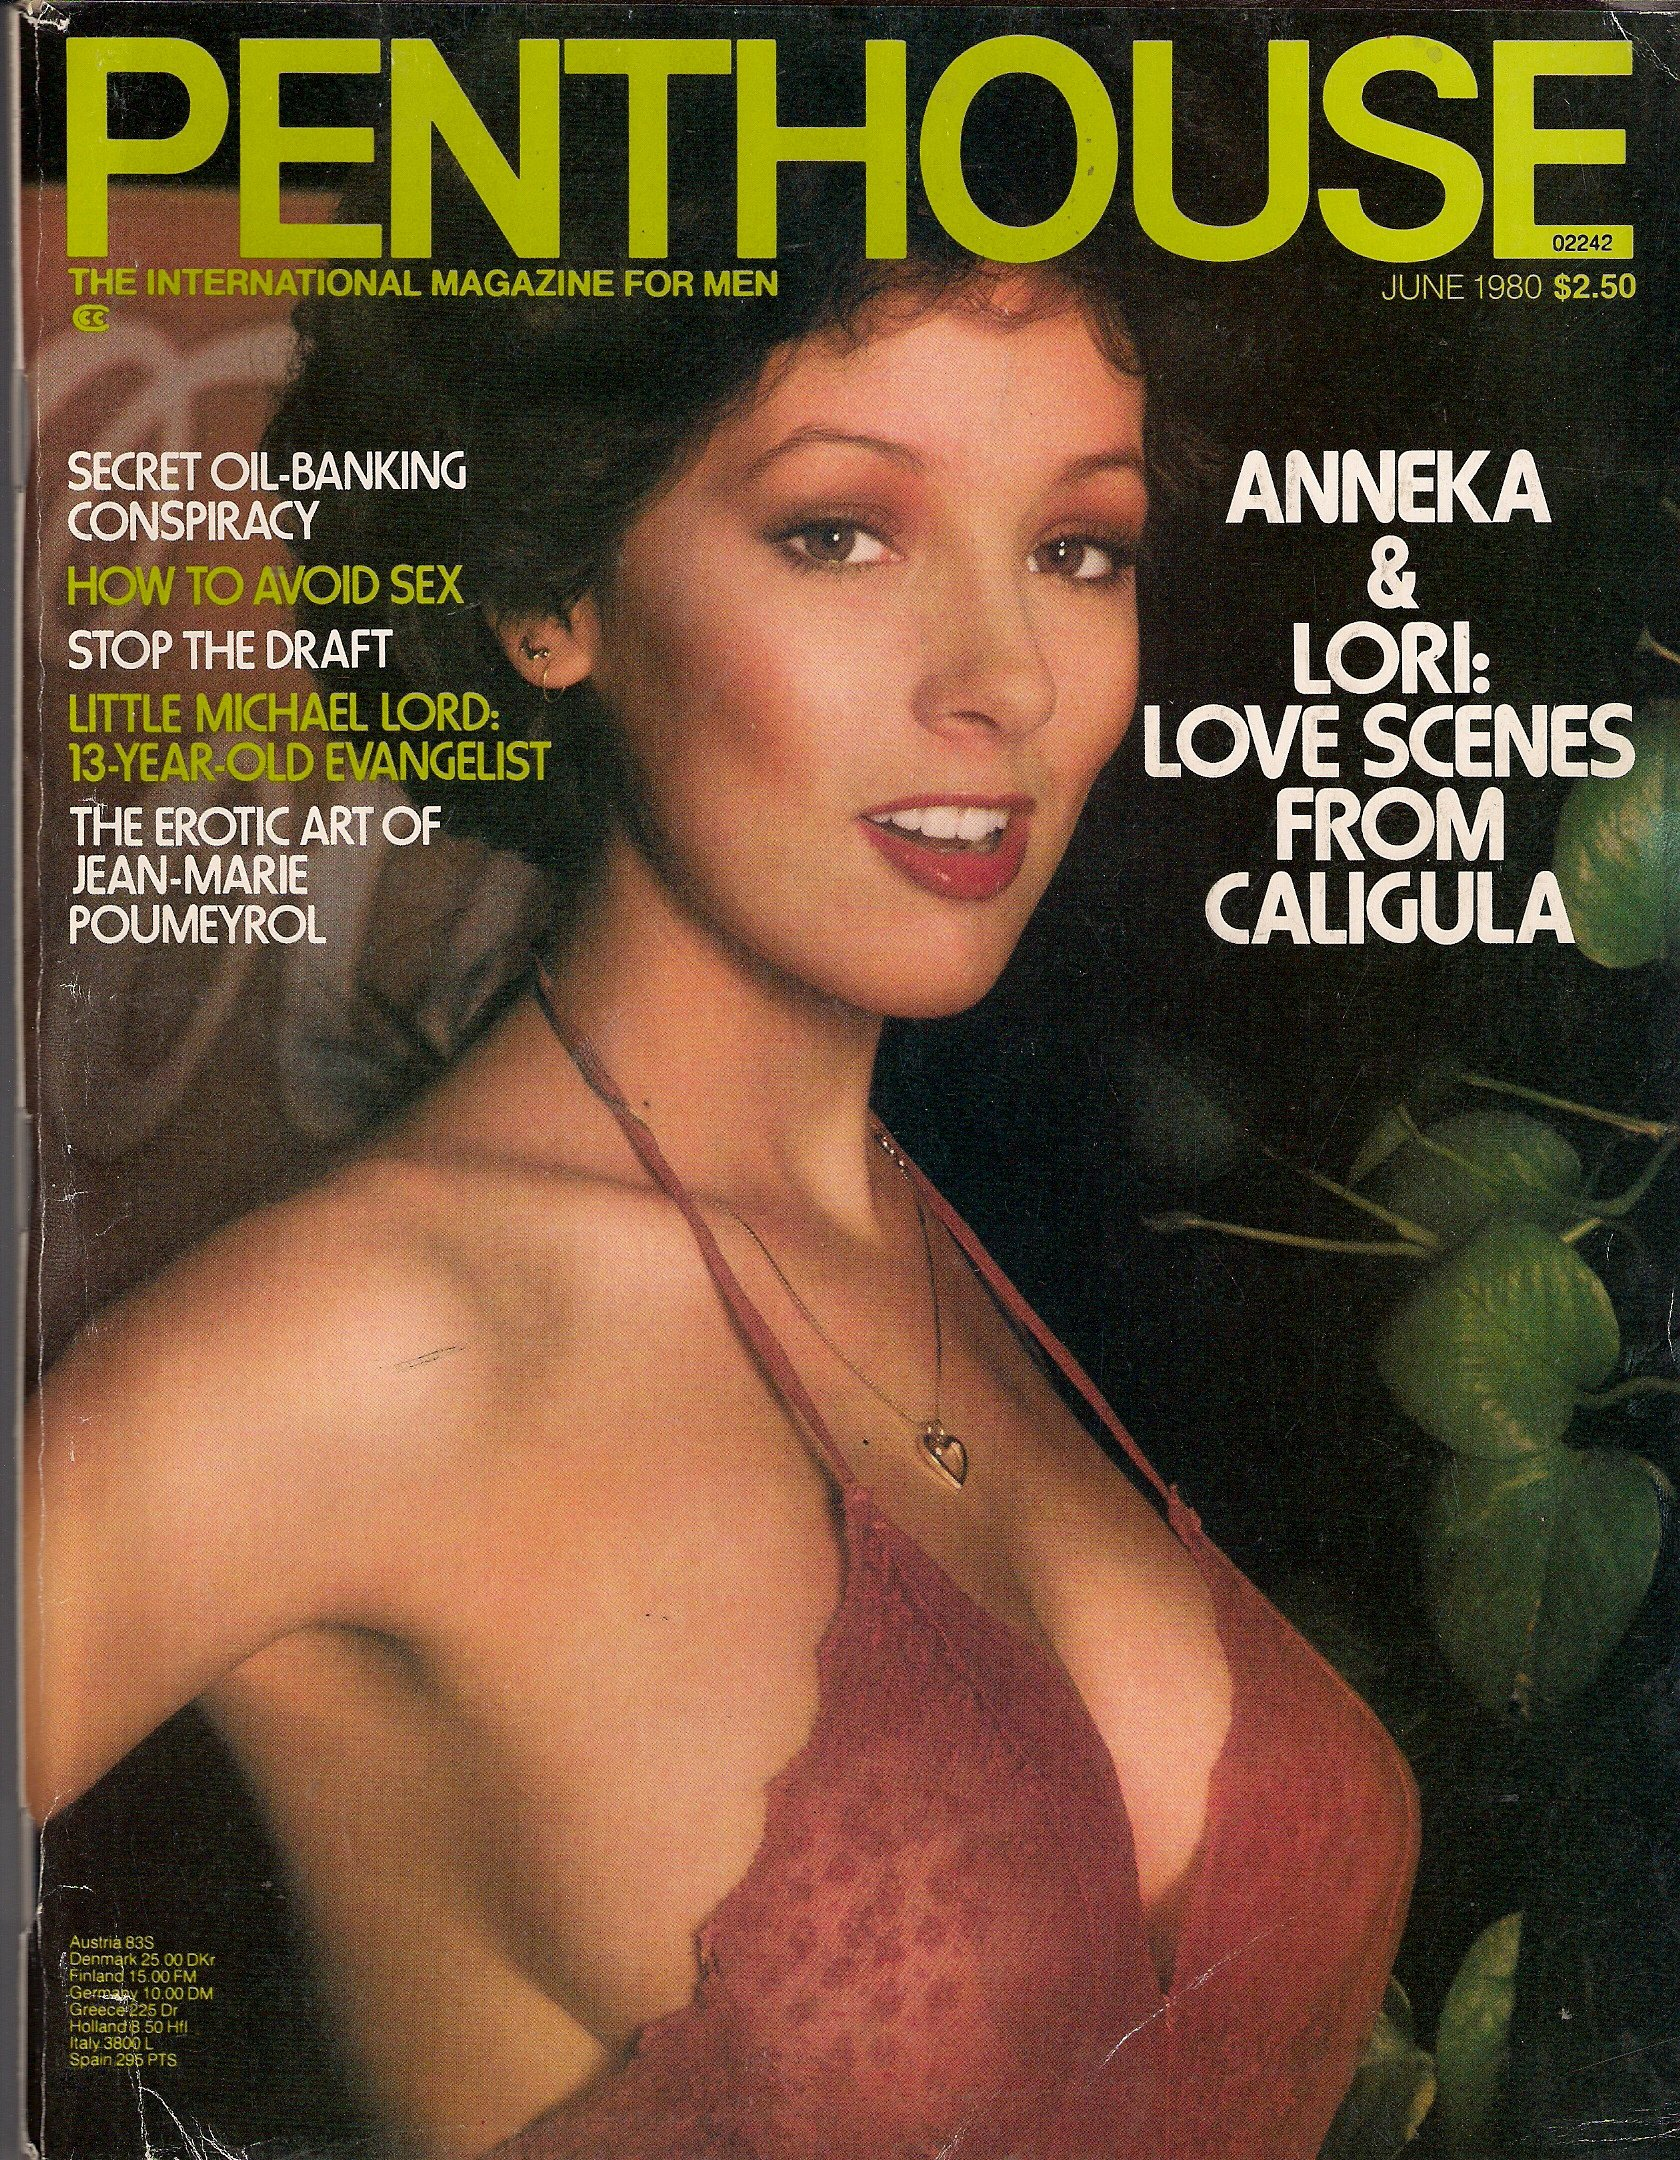 Image result for penthouse magazine caligula